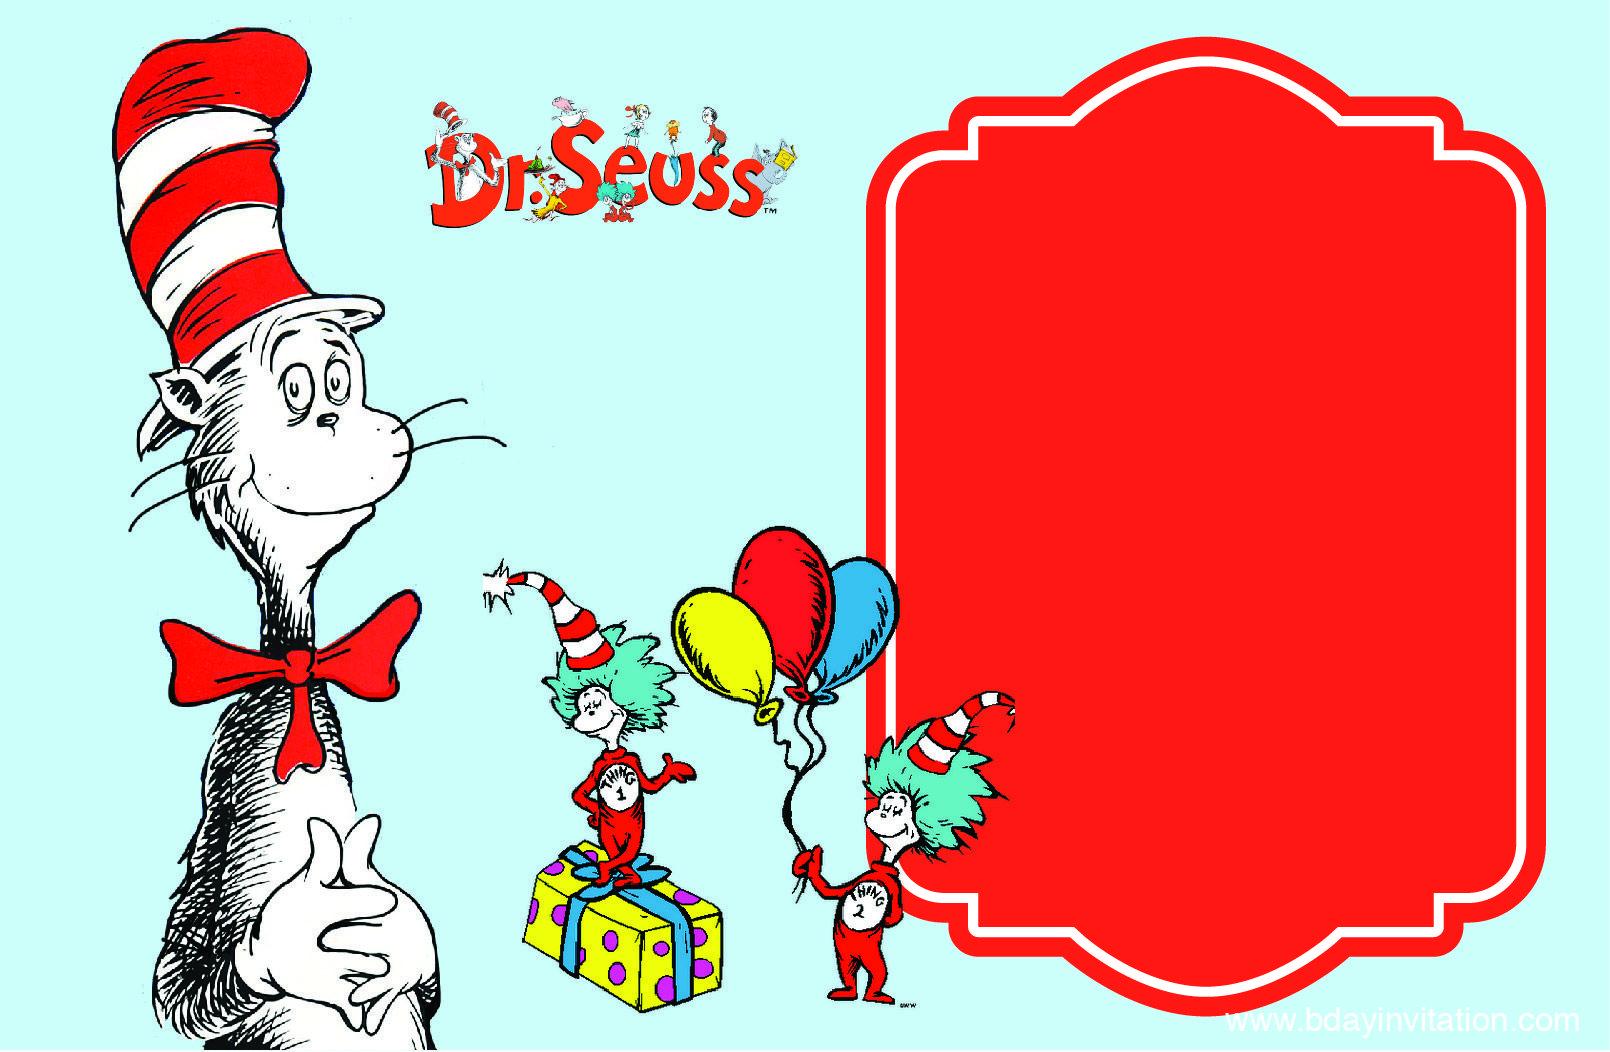 Dr Seuss Birthday Invitations Templates   Download Now Free Printable Dr Seuss Birthday Invitation Template